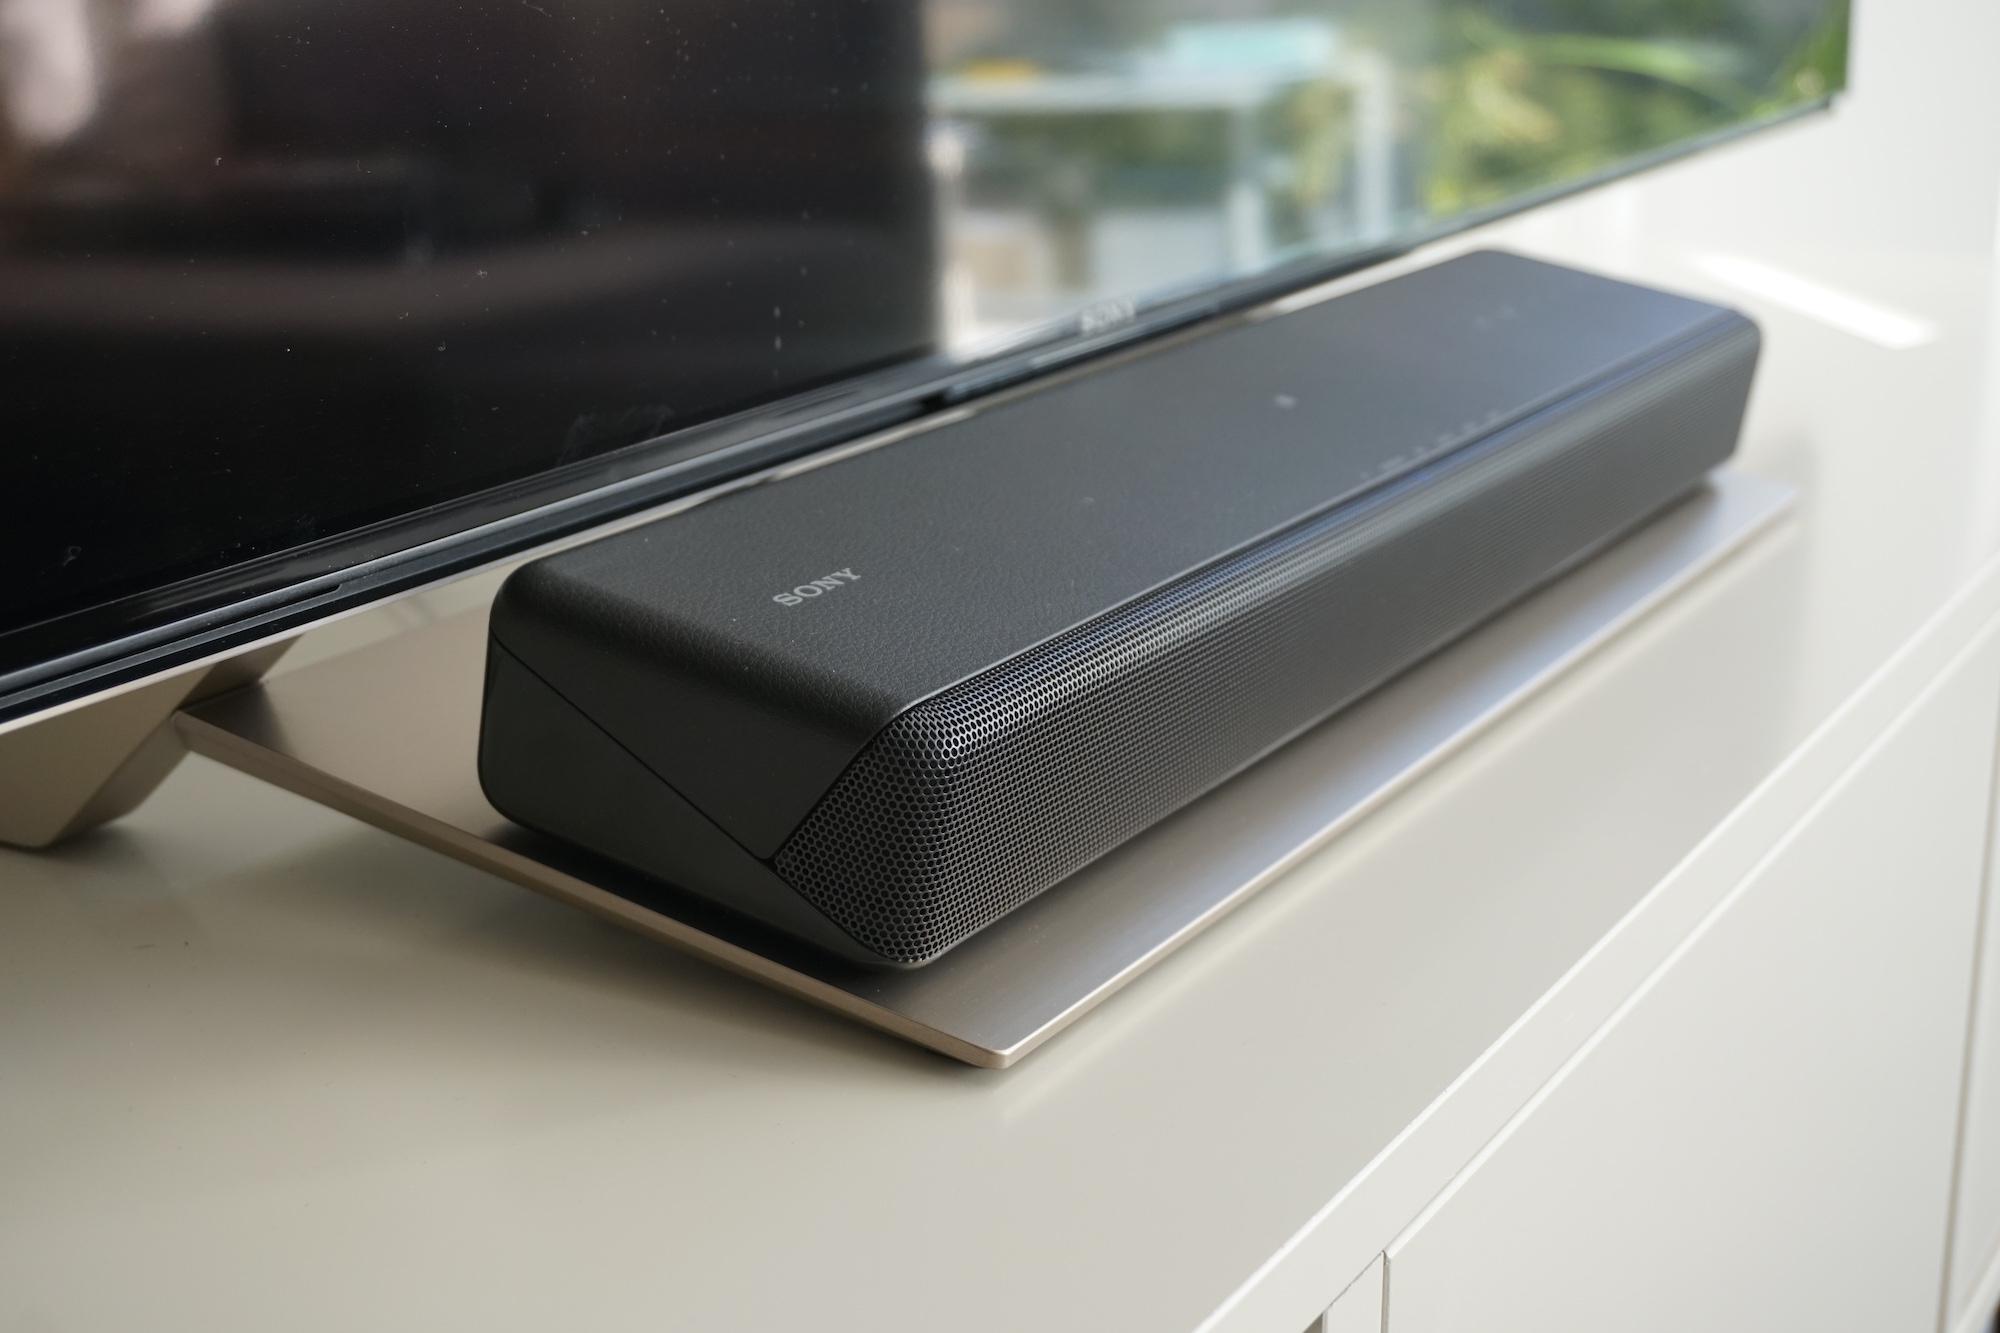 Sony HT-MT300 Compact Soundbar Review